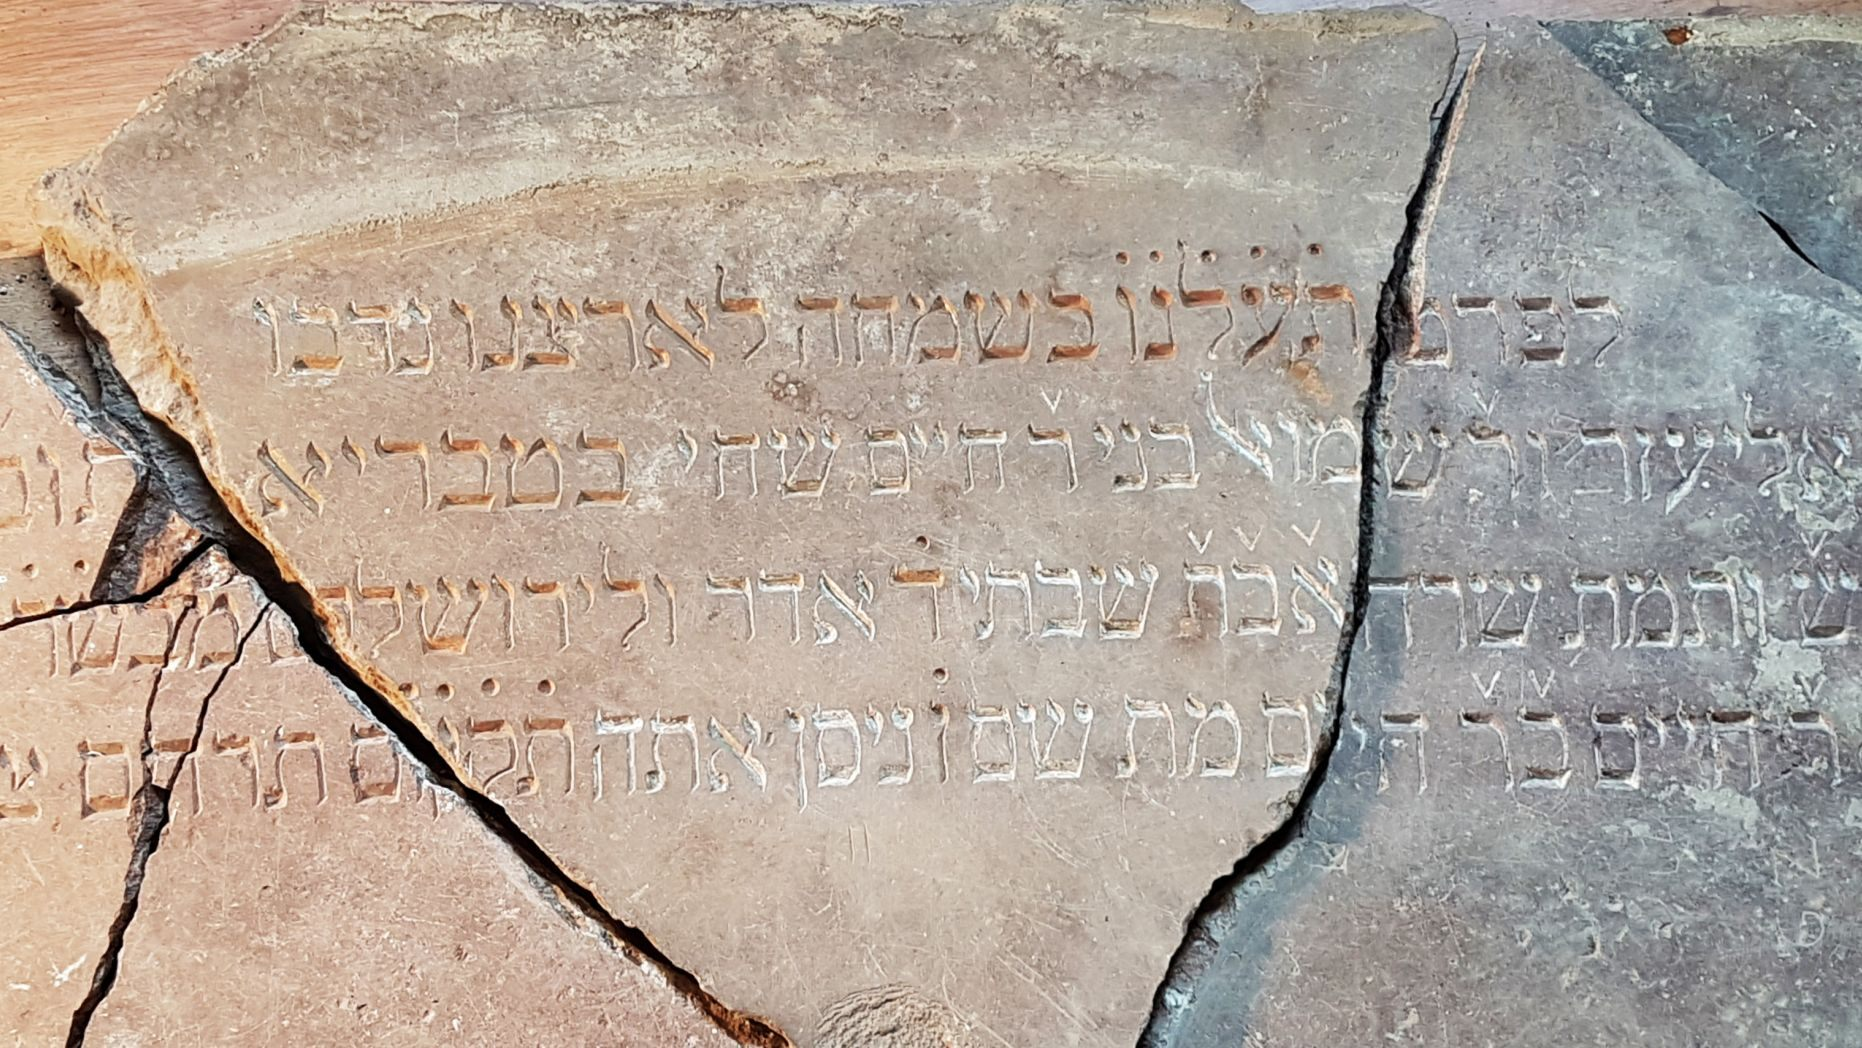 Photo: Jon Seligman, Israel Antiquities Authority